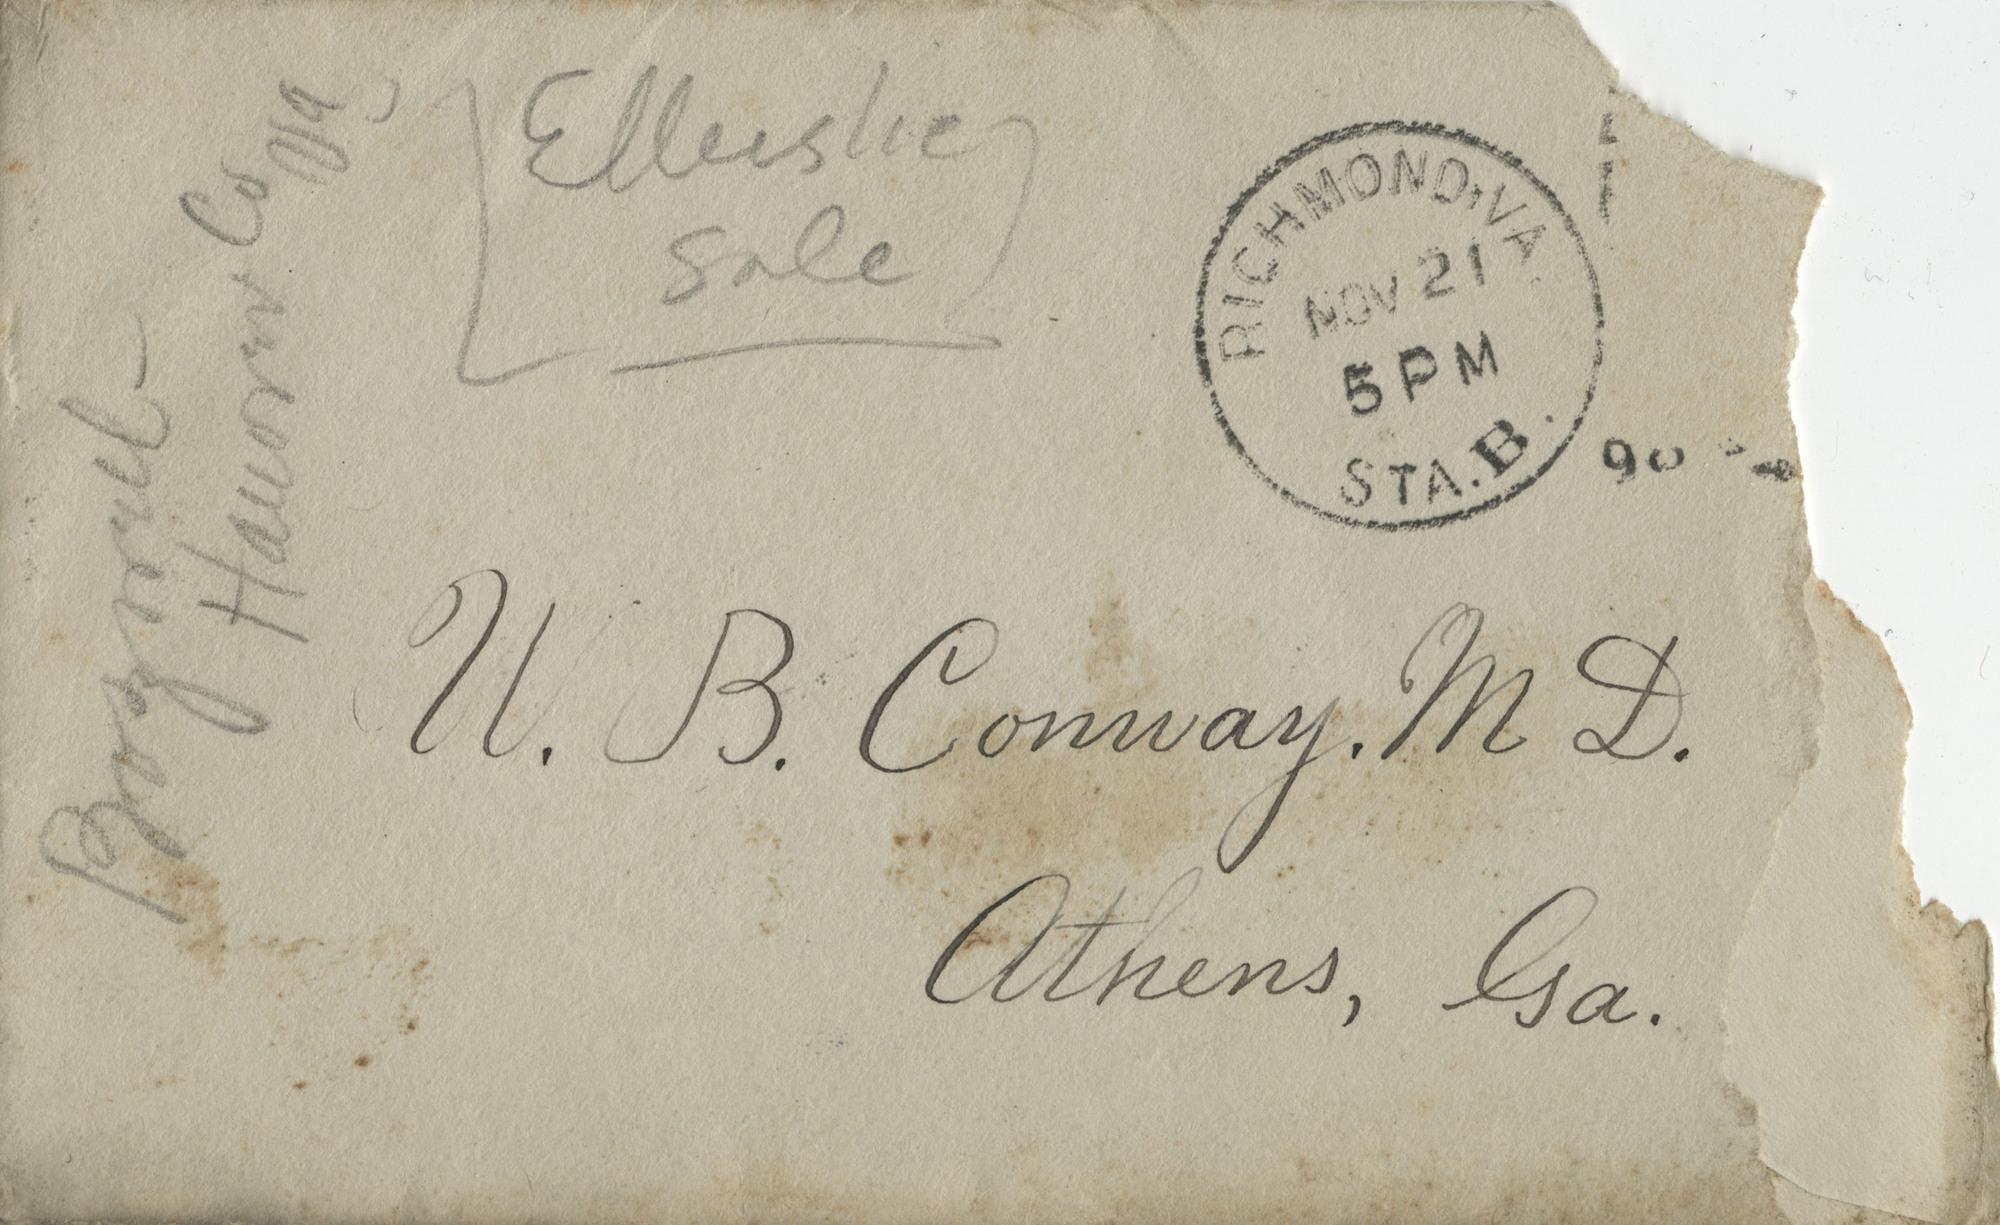 http://spec.lib.vt.edu/pickup/Omeka_upload/Ms2012-039_ConwayCatlett_F2_Letter_1898_1120_enva.jpg